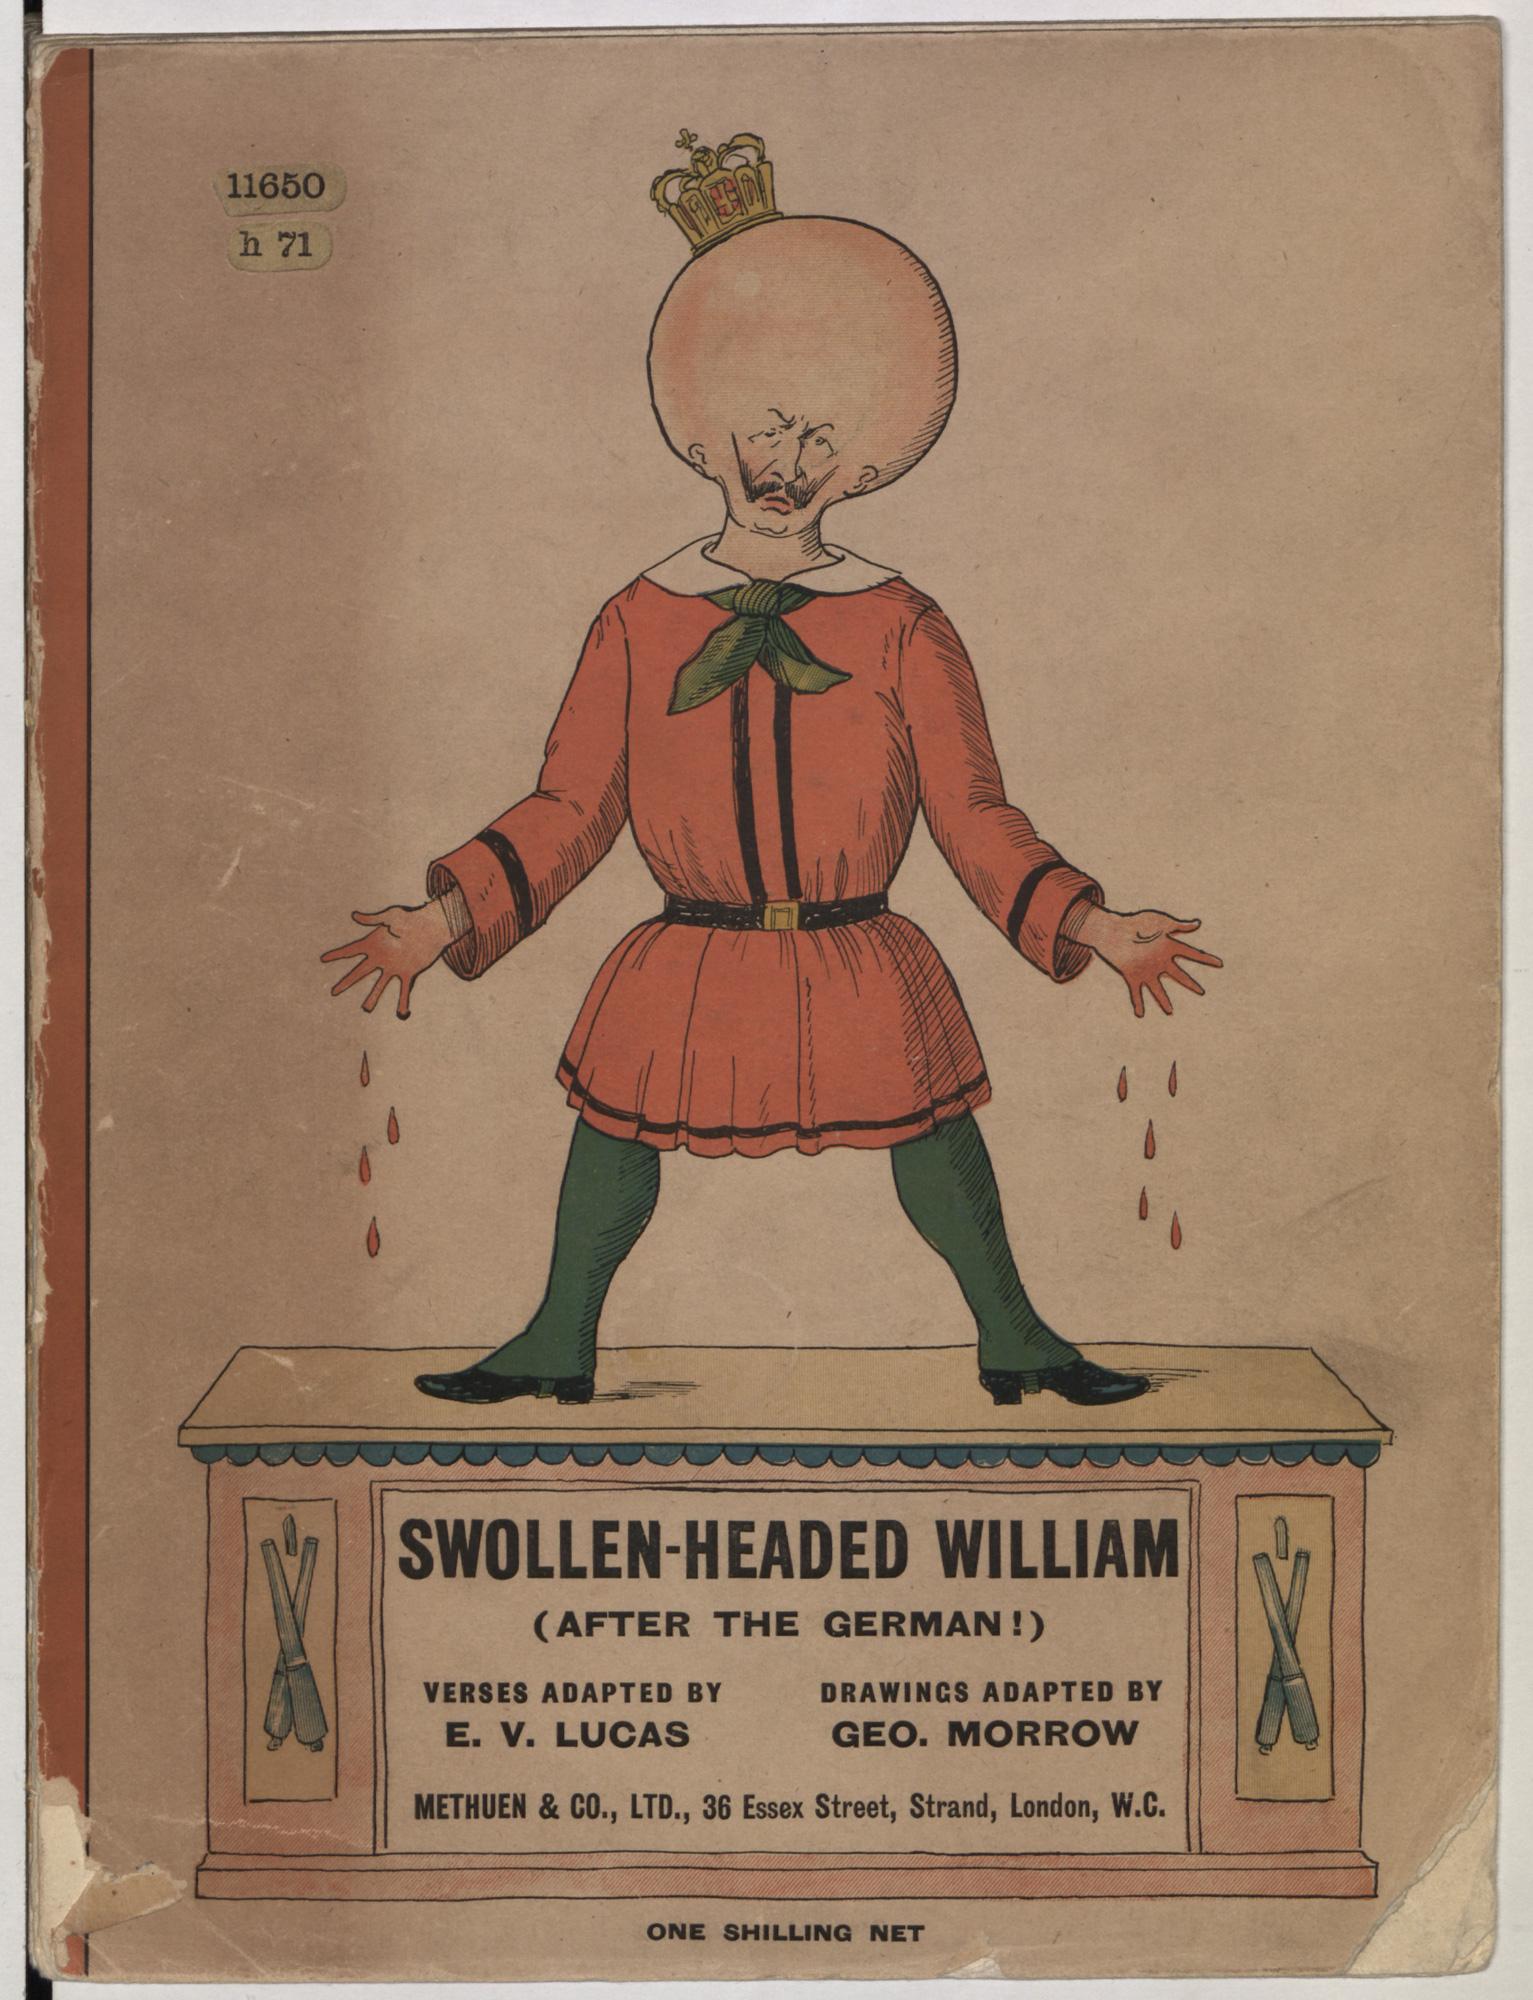 Swollen-headed William (after the German!)